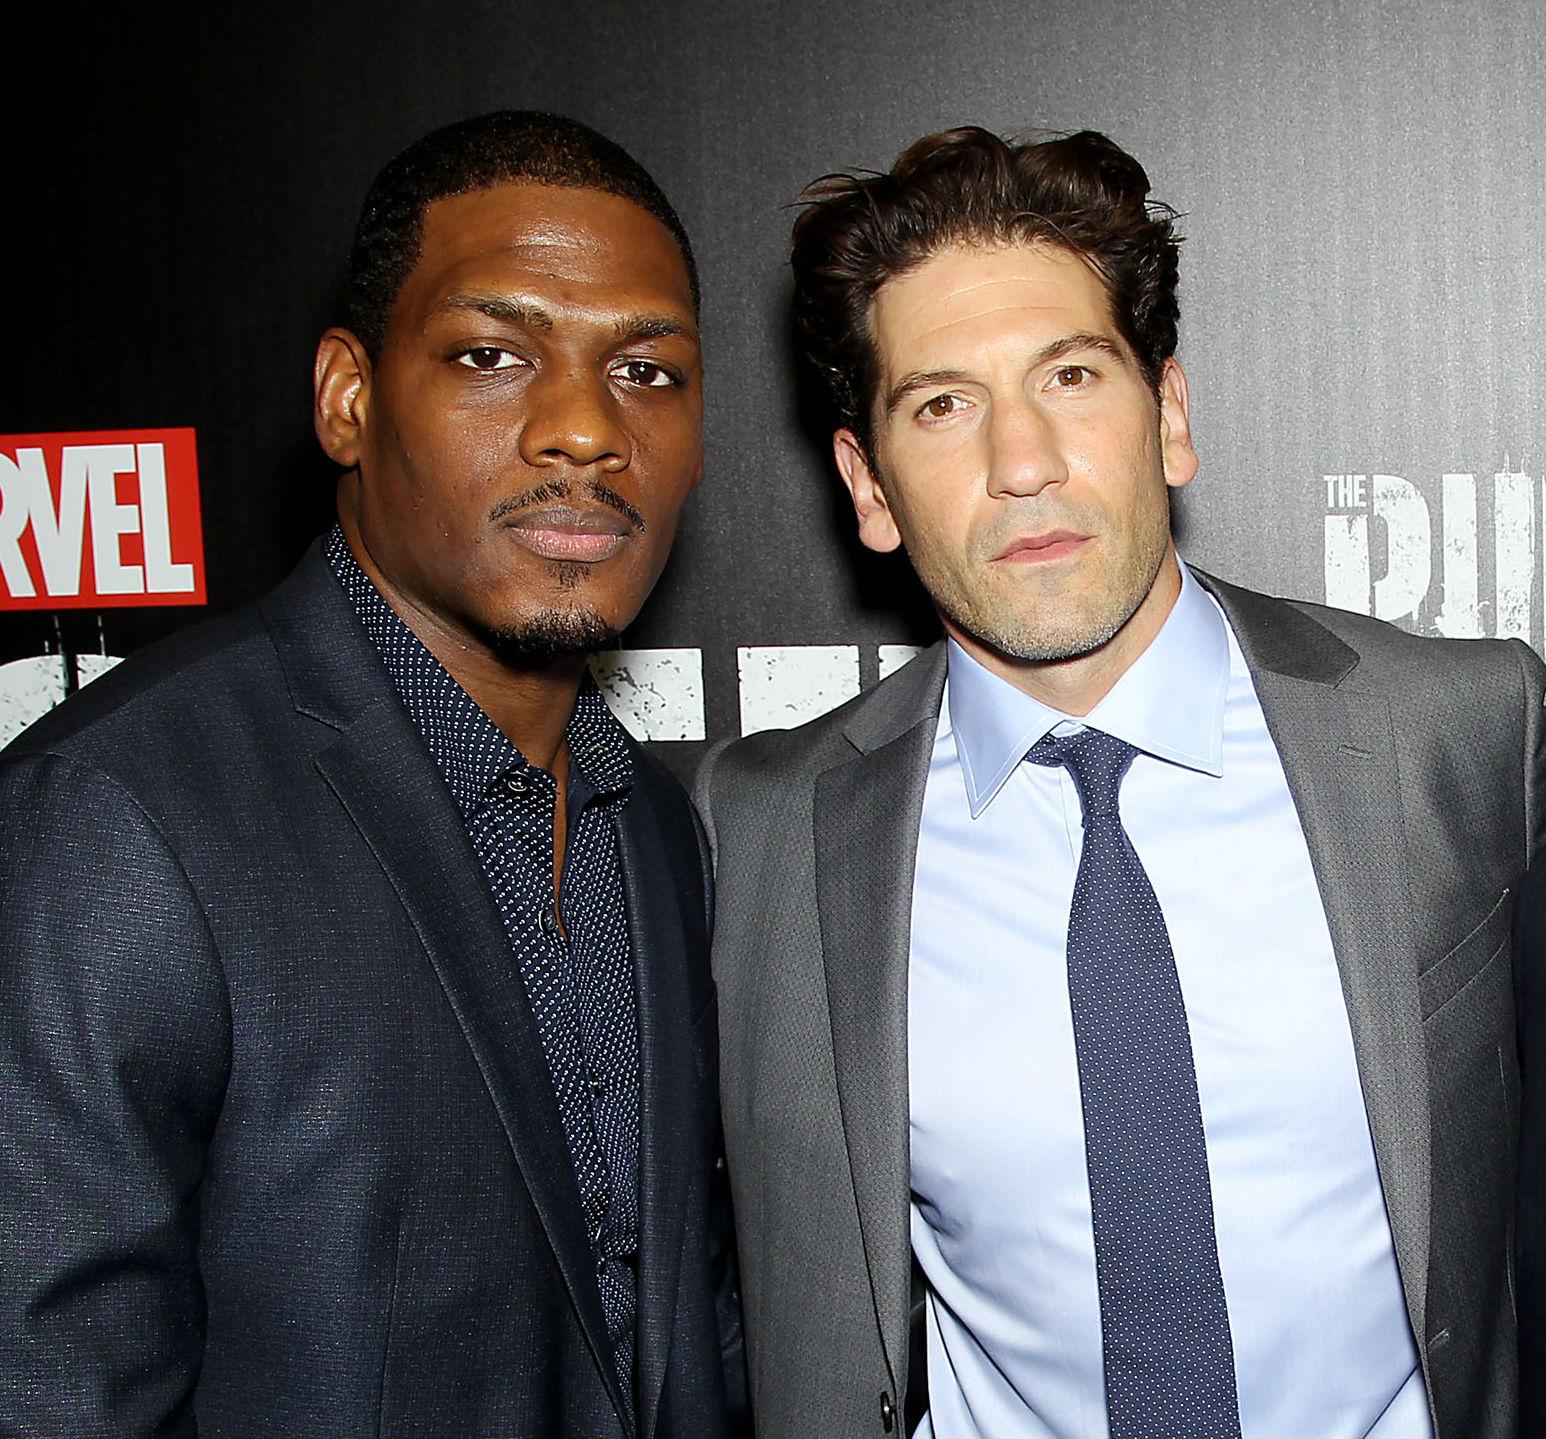 Exclusive: Jason R  Moore Talks Netflix's The Punisher - Blackfilm